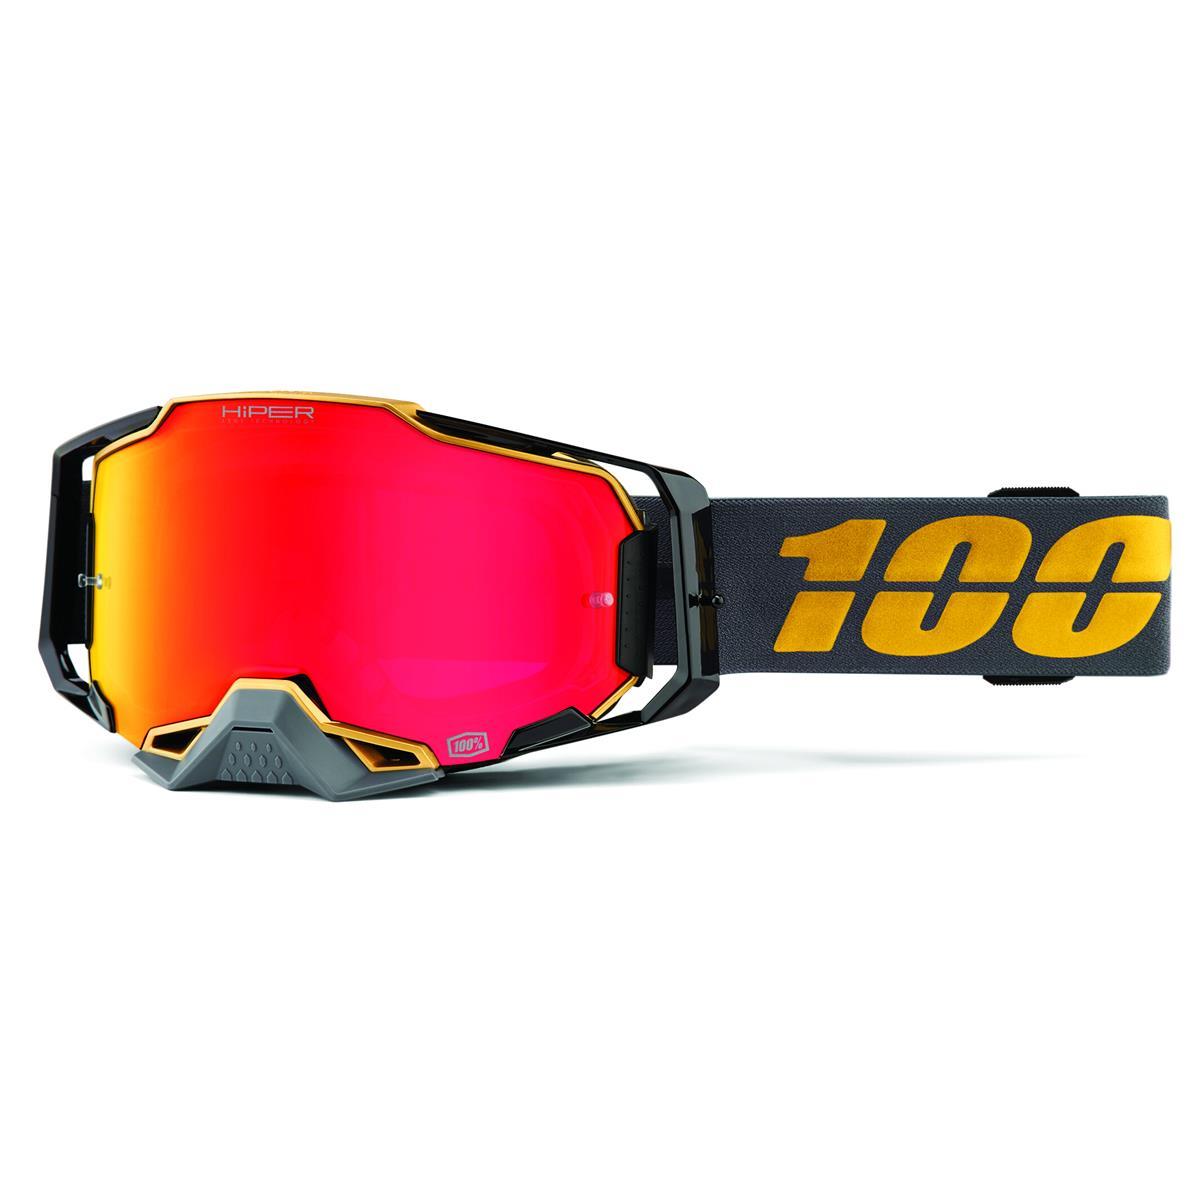 100% Crossbrille Armega Falcon 5 - Hiper Mirror, Anti Fog